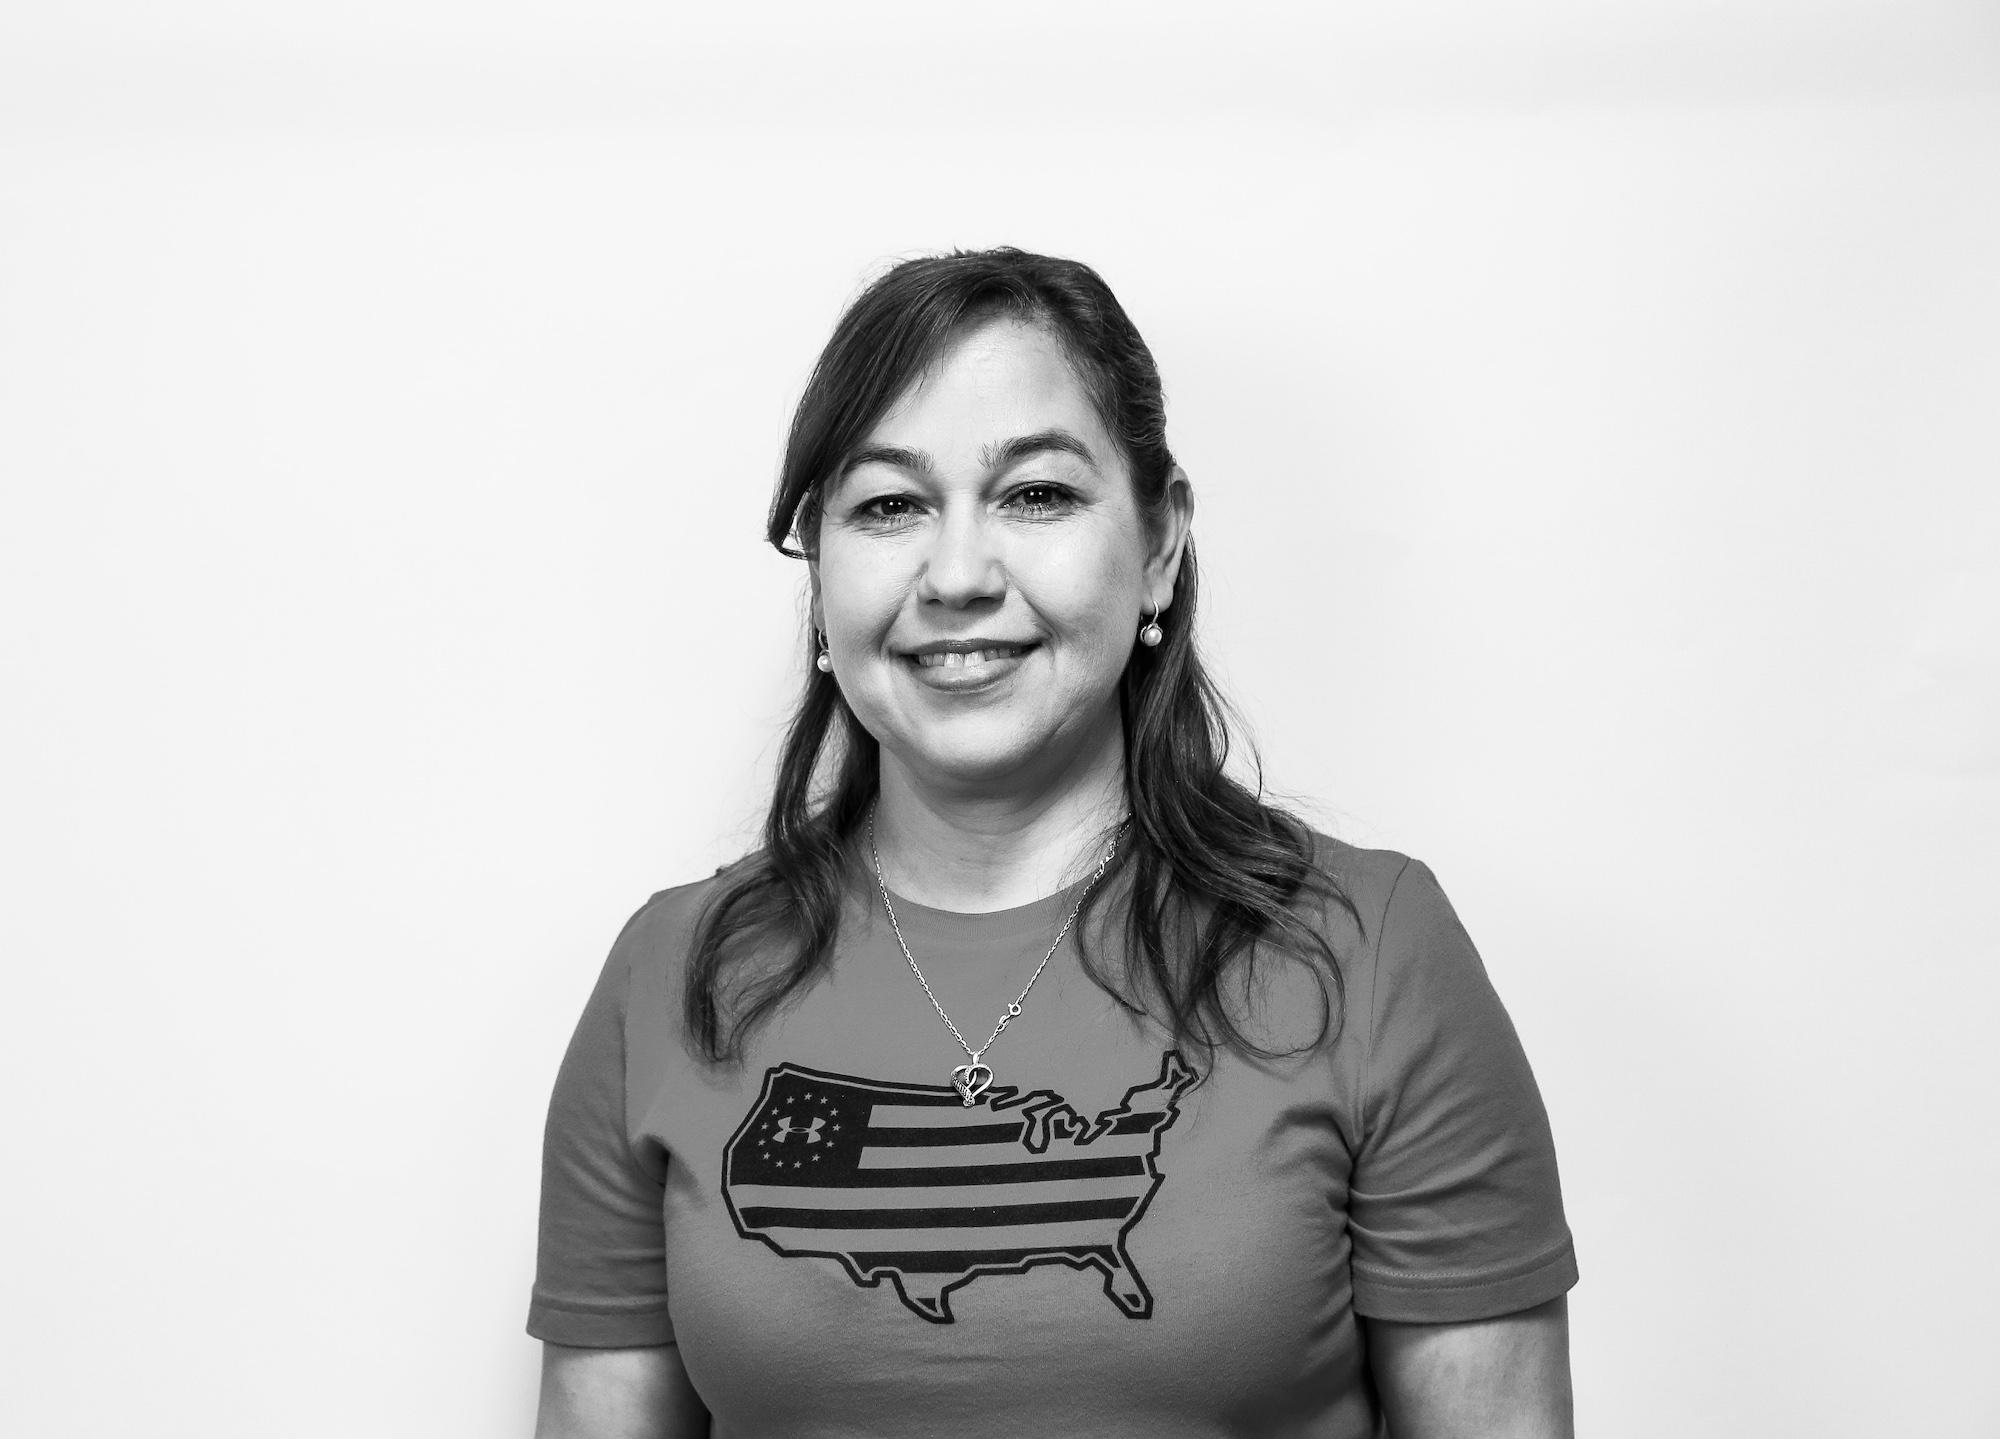 Alma - Superior Ink team member